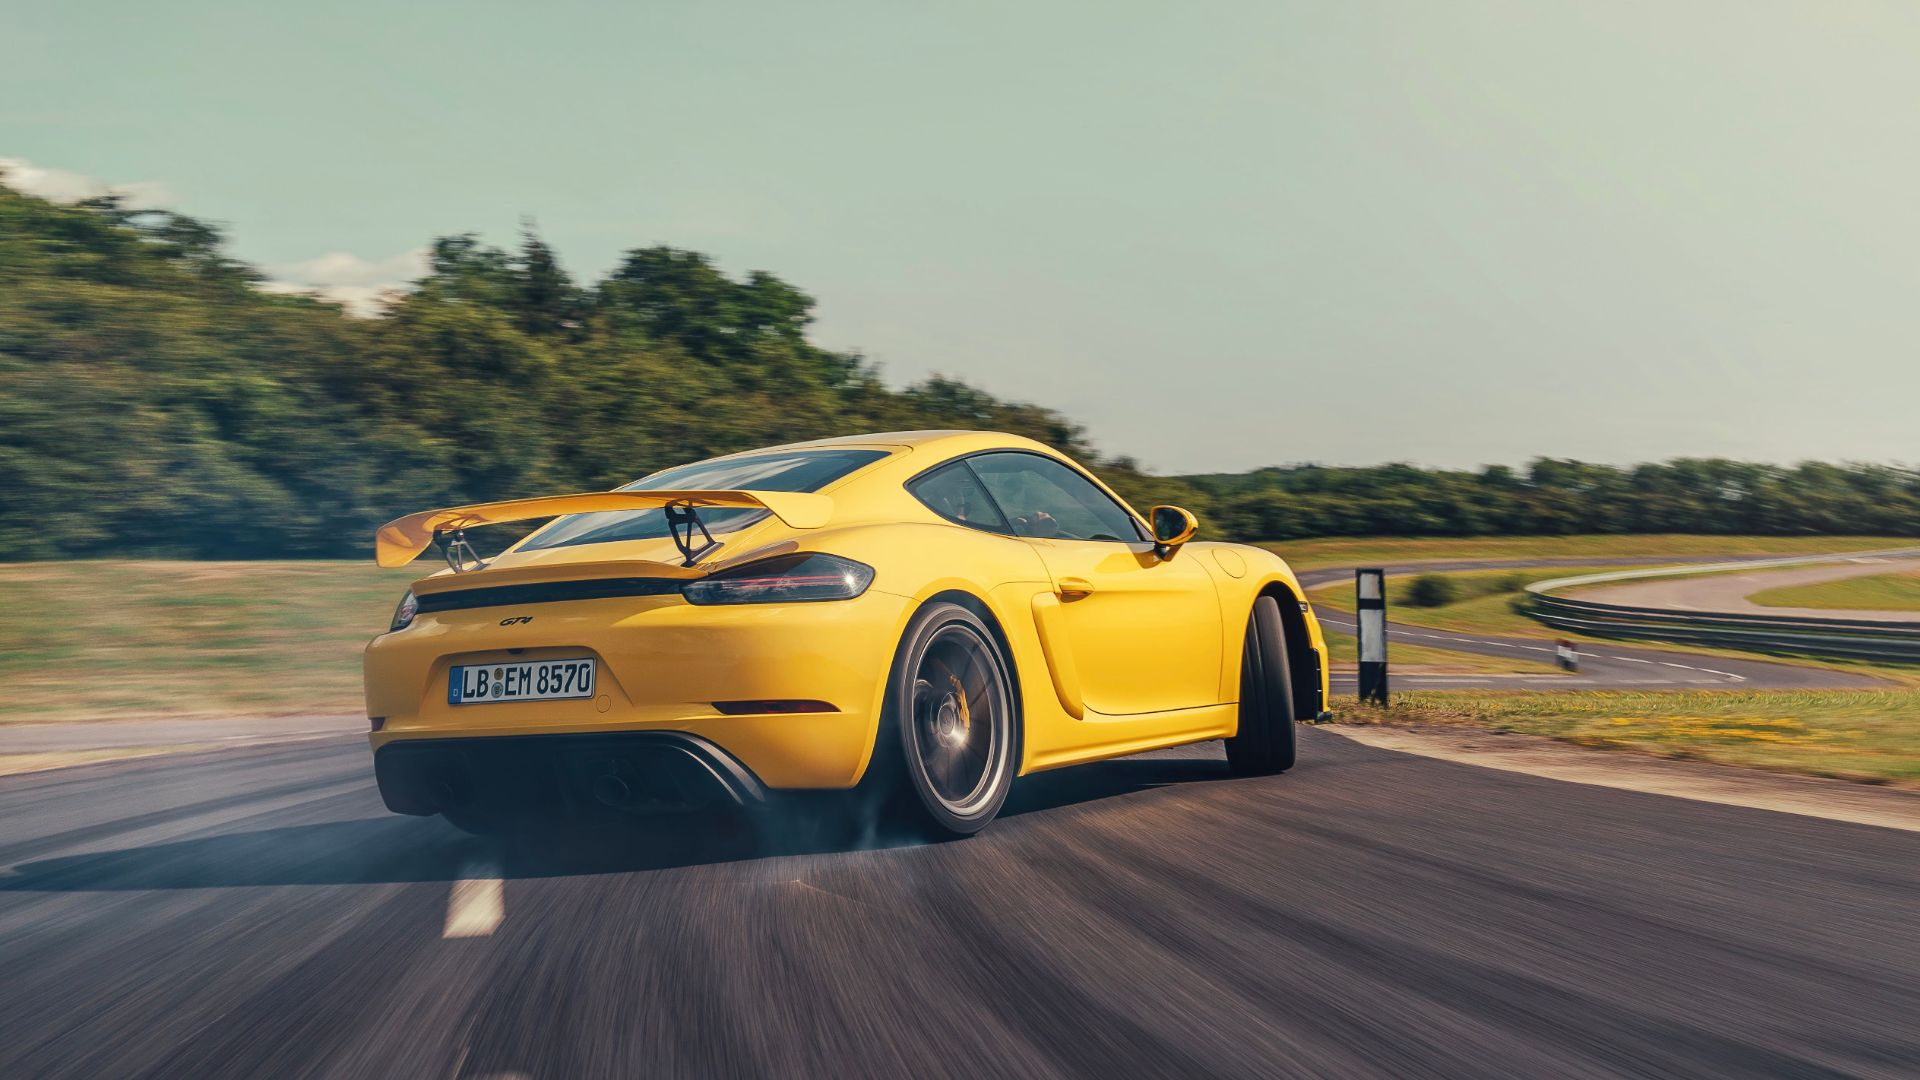 Porsche Photographer Shares Secrets Of Amazing Car Photos Motoring Research